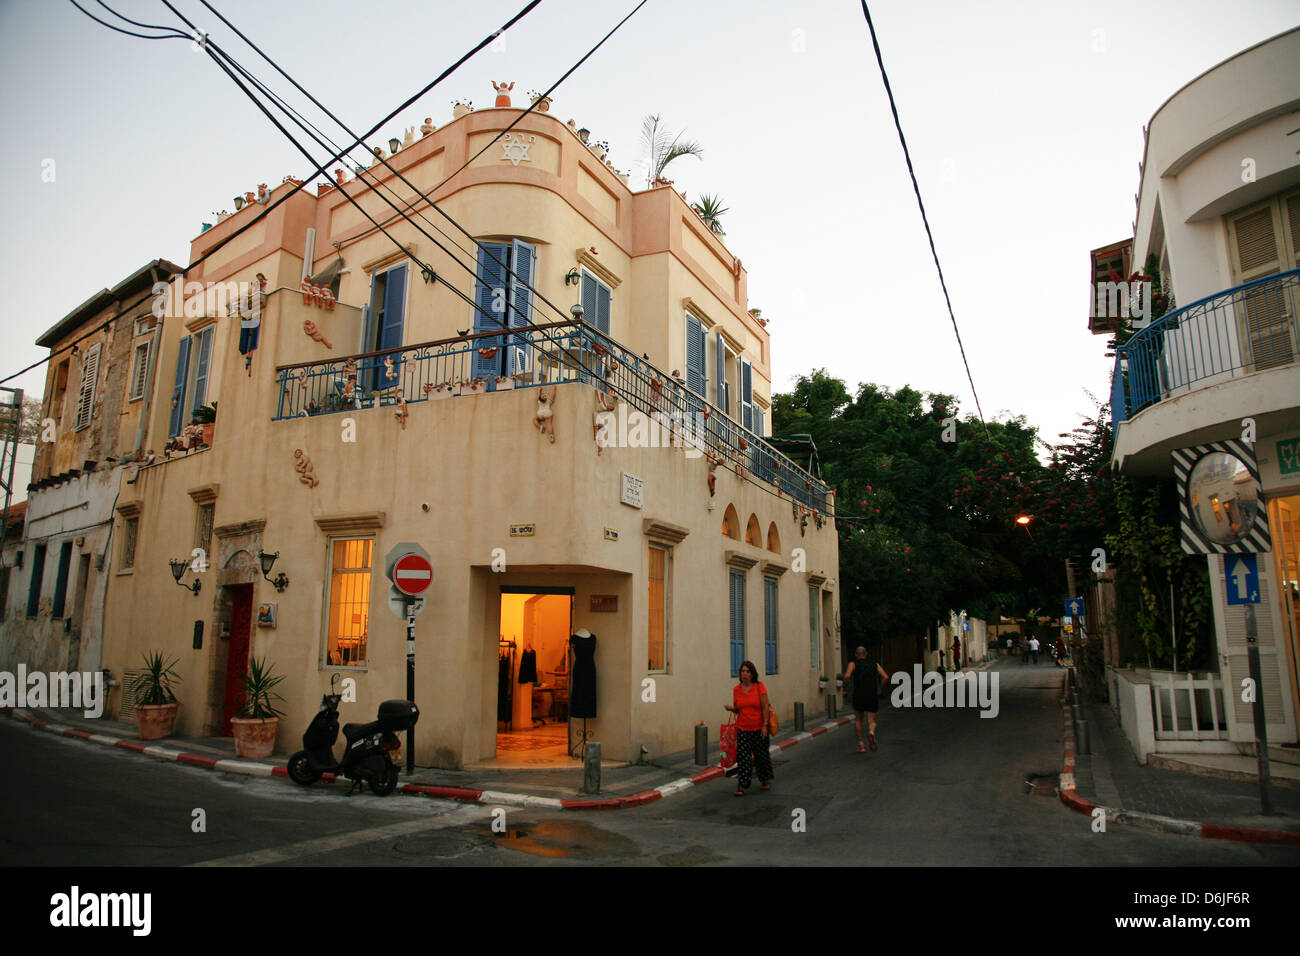 Street scene at the trendy Neve Tzedek neighbourhood, Tel Aviv, Israel, Middle East - Stock Image